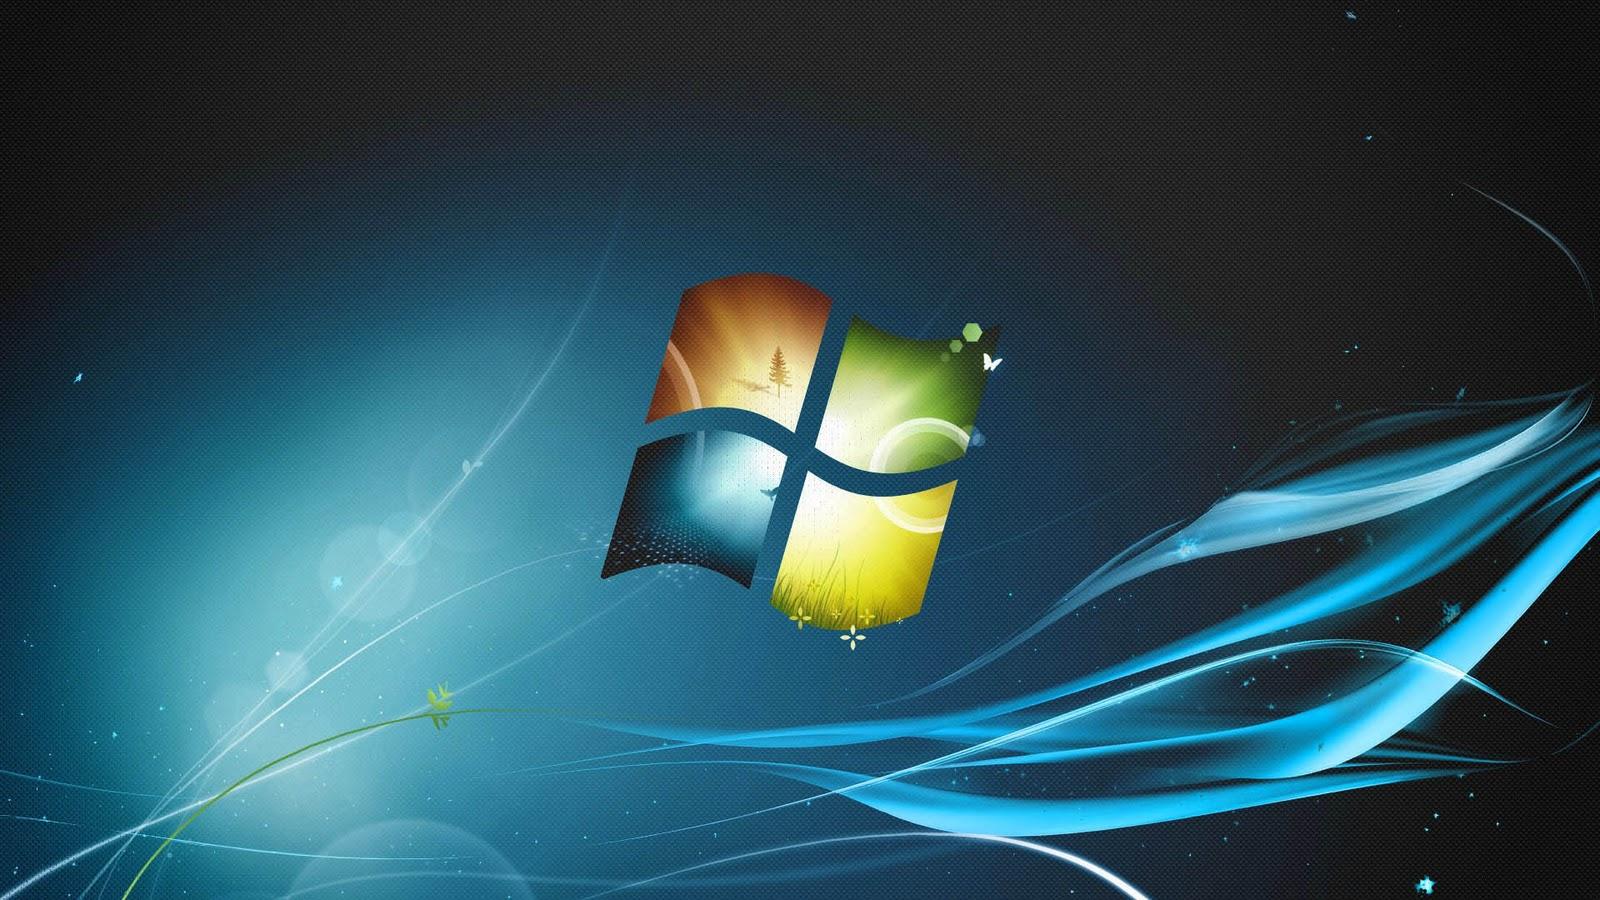 http://3.bp.blogspot.com/-KK3rAratNQo/TruzTLOuBVI/AAAAAAAAQ-0/VBKkWPChAk4/s1600/Mooie-windows-achtergronden-leuke-hd-windows-wallpapers-afbeelding-plaatje-1.jpg